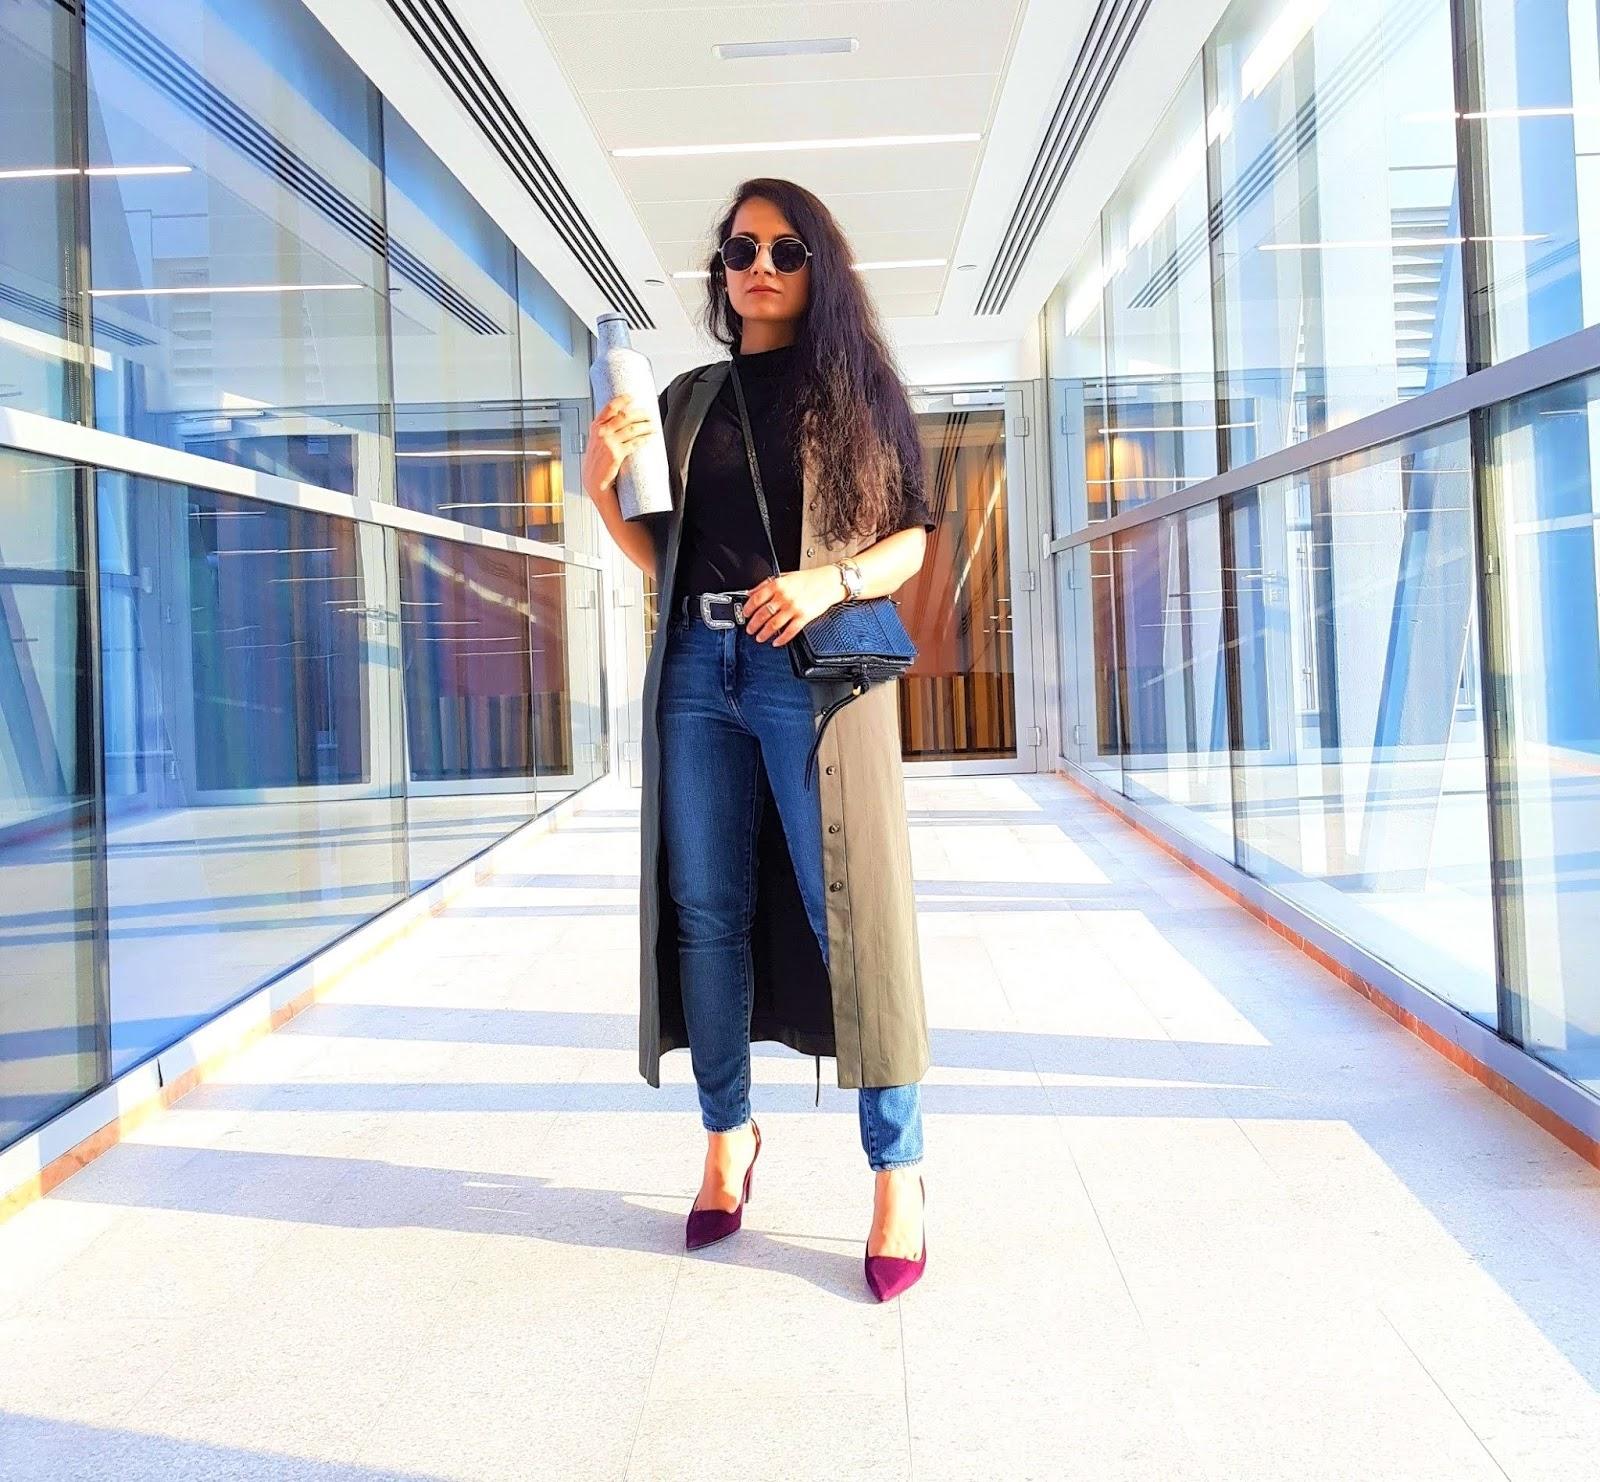 Vegan fashion Best eco friendly jeans - Sustainable Denim Brands - Vegan Jeans